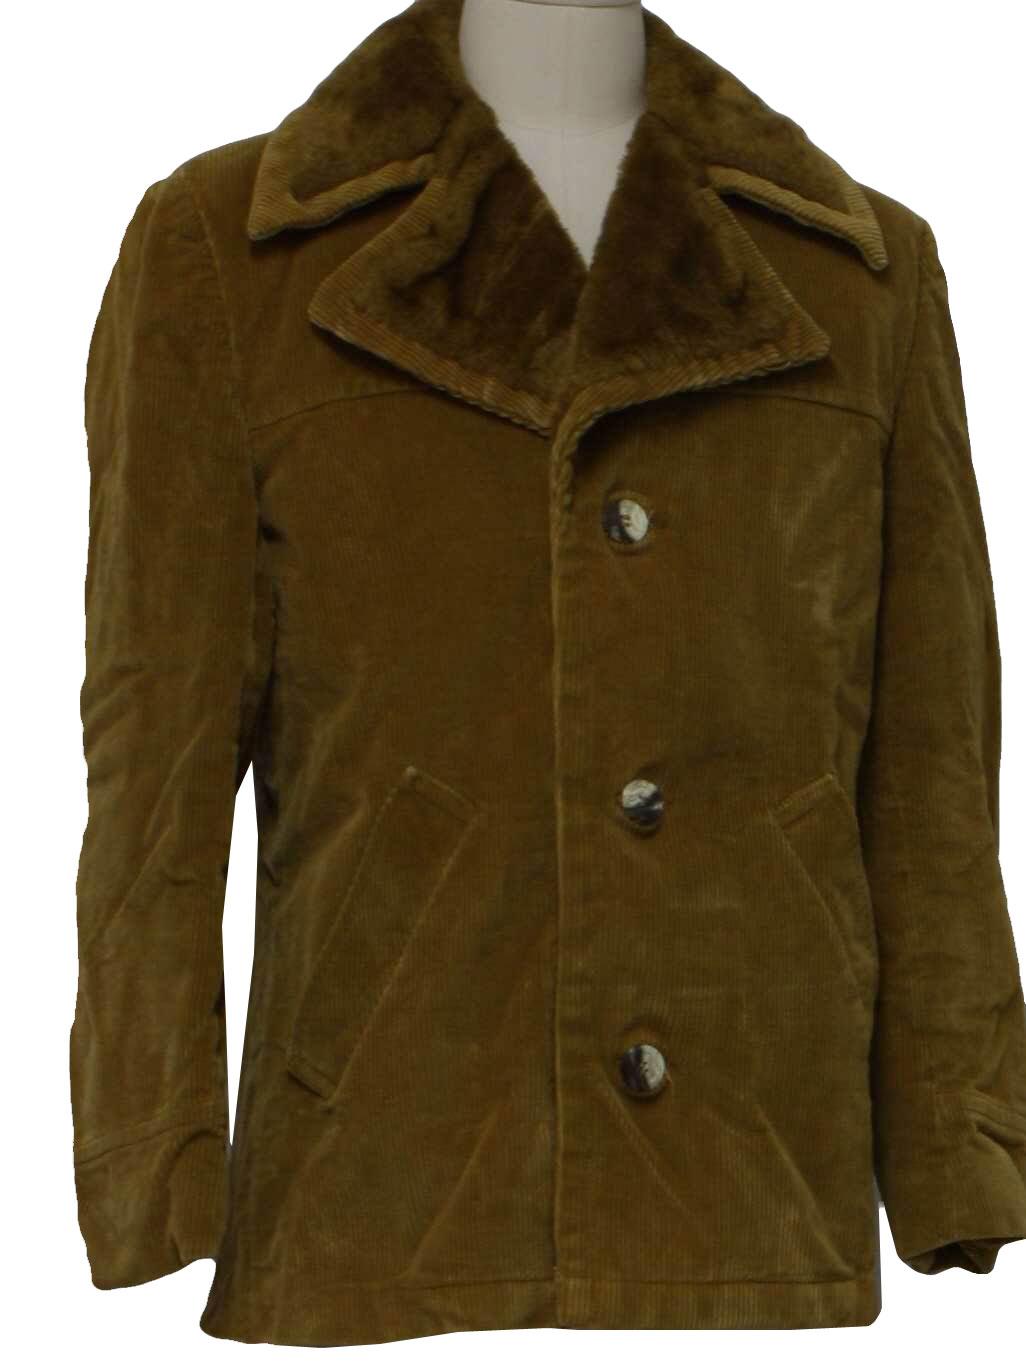 cresco men Men's size 42 cresco catalina original brown leather coat jacket | clothing, shoes & accessories, men's clothing, coats & jackets | ebay.